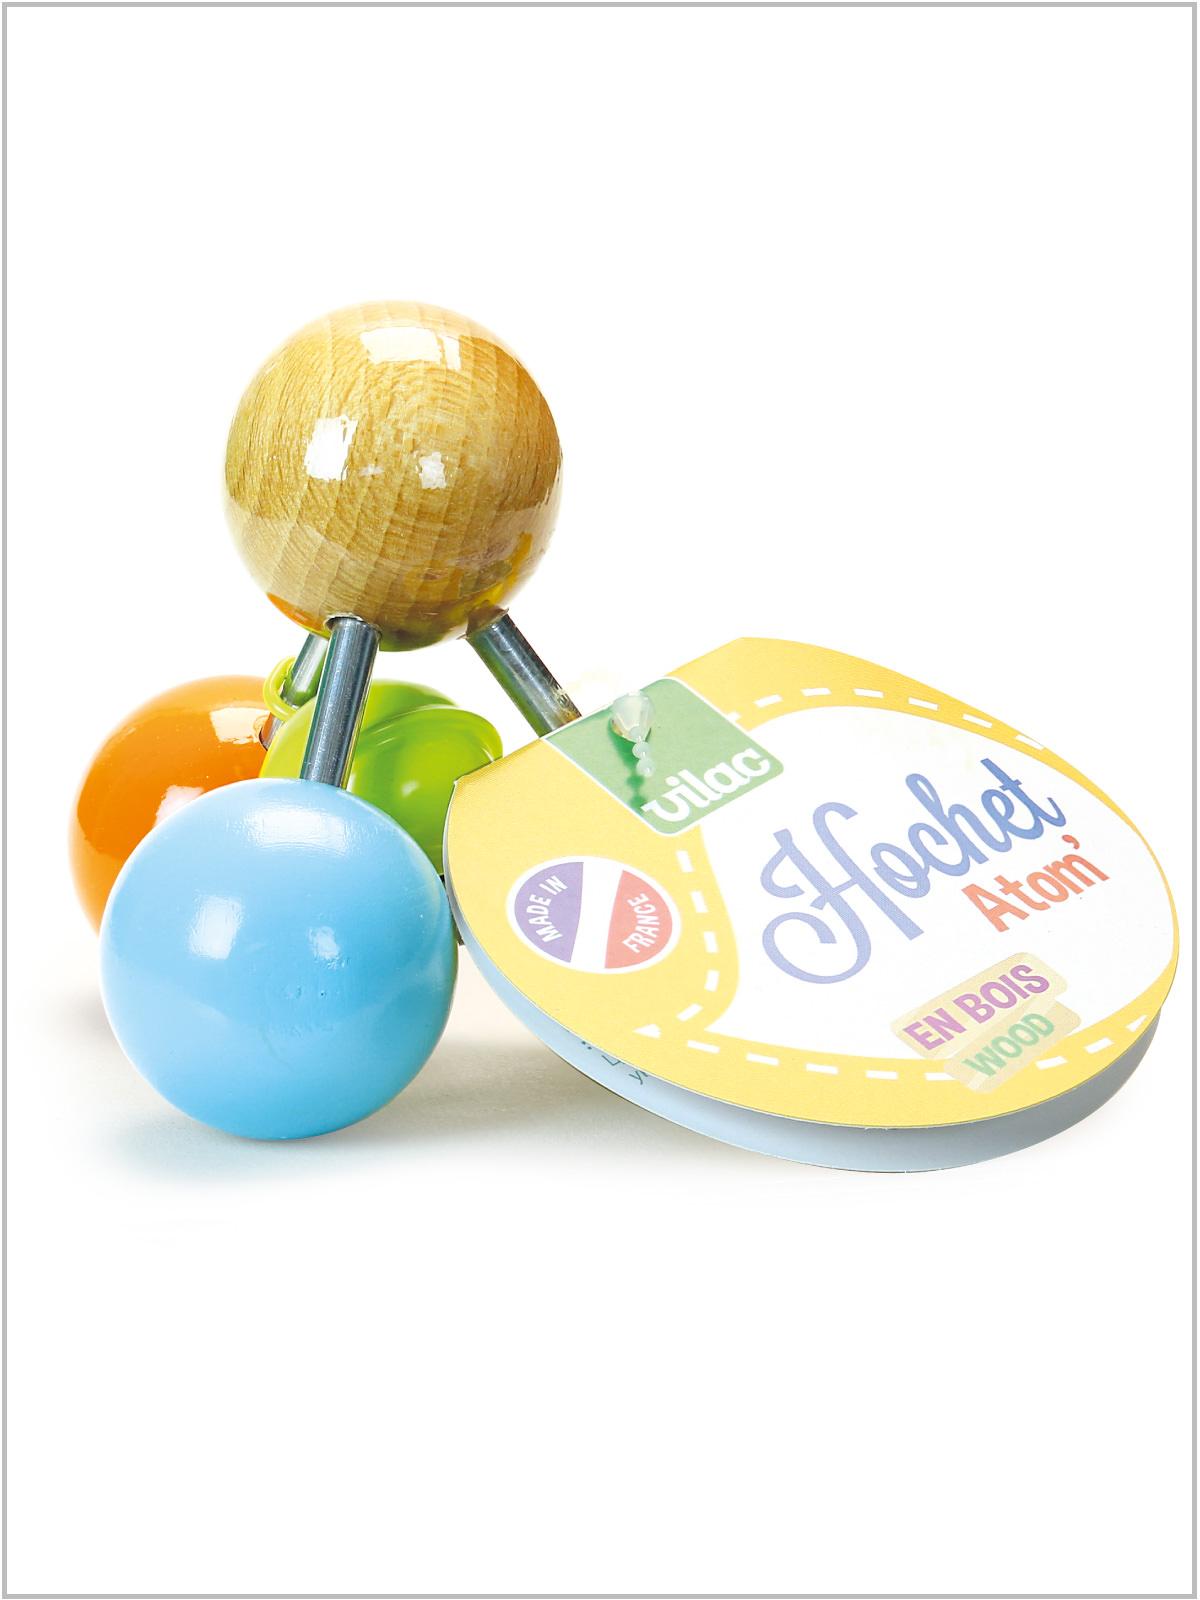 frederickandsophie-toys-vilac-wooden-atom-maracas-rattle